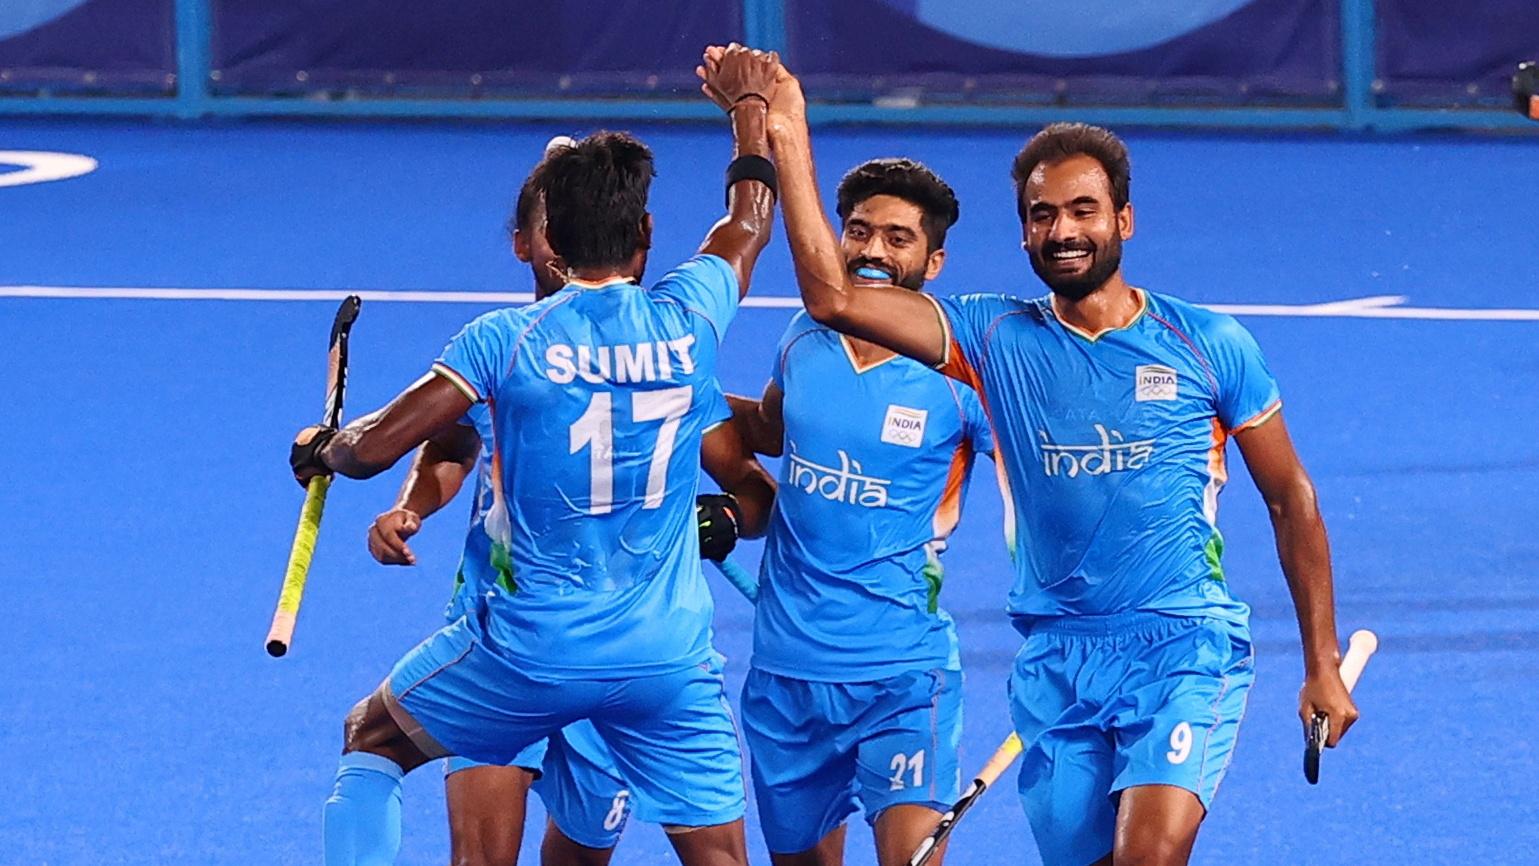 Tokyo 2020 Olympics - Hockey - Men - Quarterfinal - India v Britain - Oi Hockey Stadium, Tokyo, Japan - August 1, 2021. Gurjant Singh of India celebrates with teammates after scoring. REUTERS/Bernadett Szabo